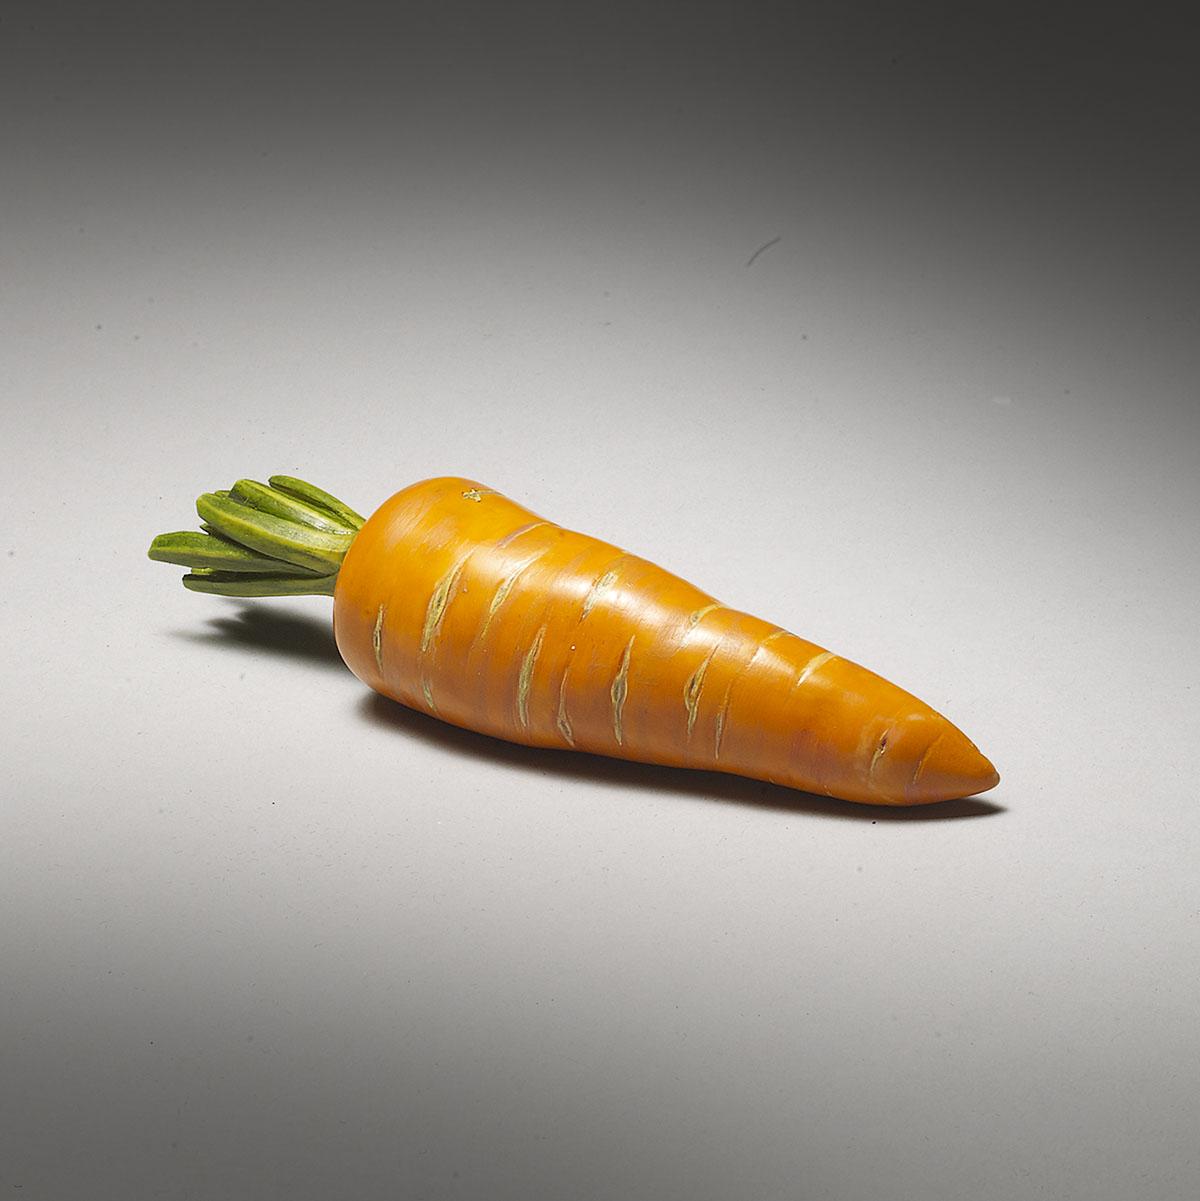 **SOLD**Ivory Okimono of a Carrot